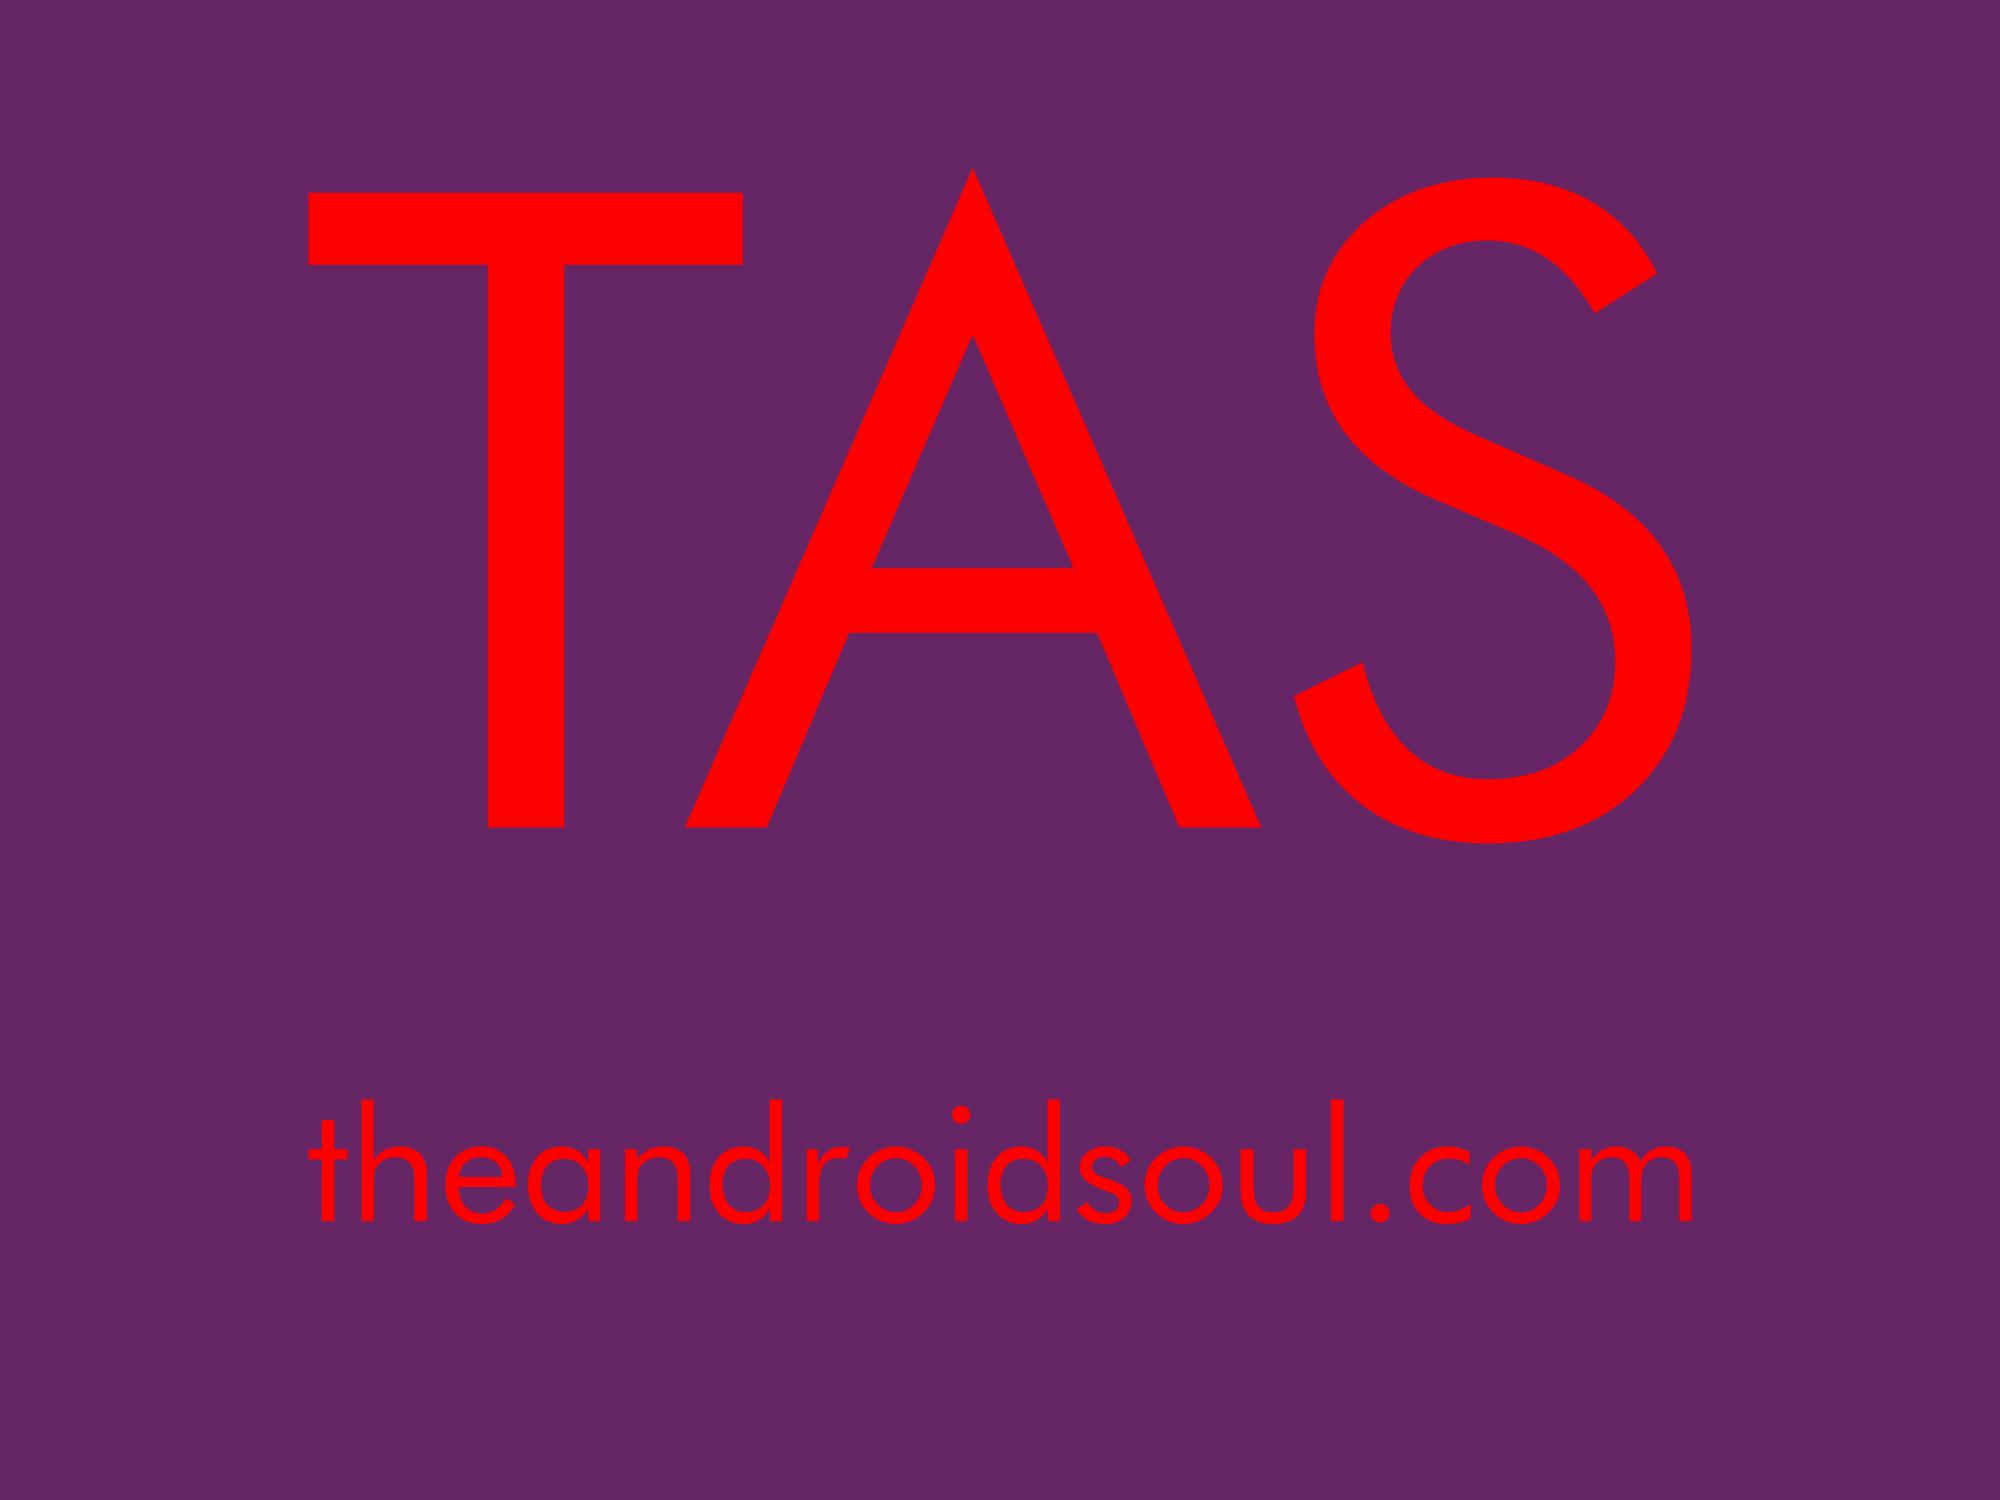 theandroidsoul-tas-about-us